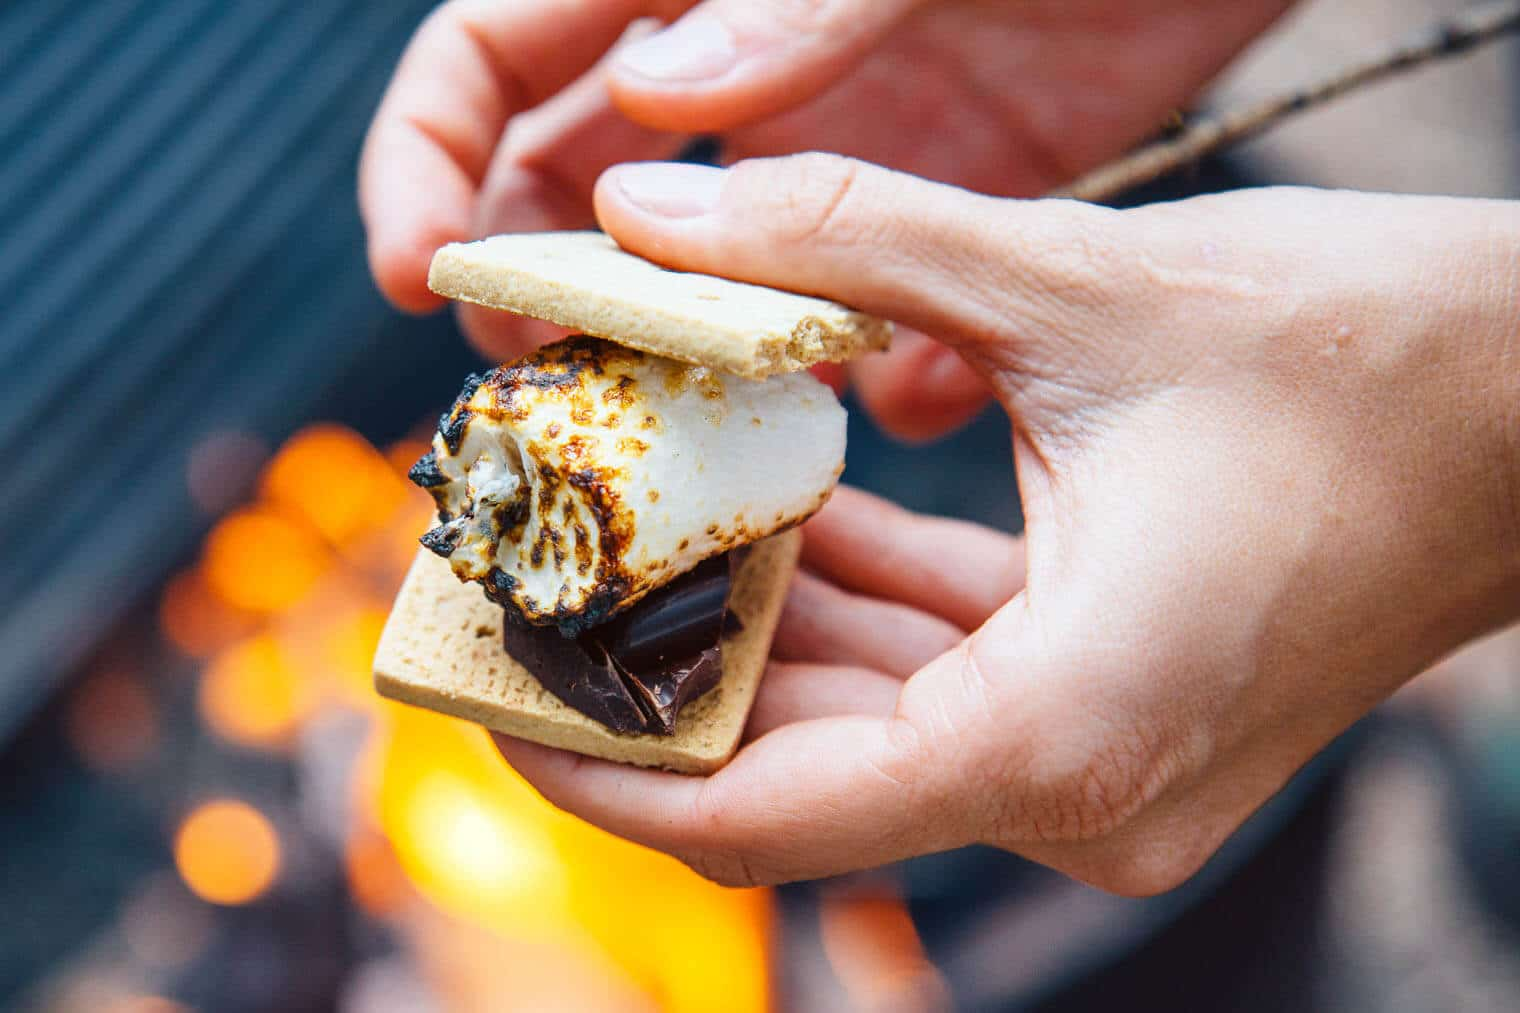 Vegan s'mores with Dandies vegan marshmallows